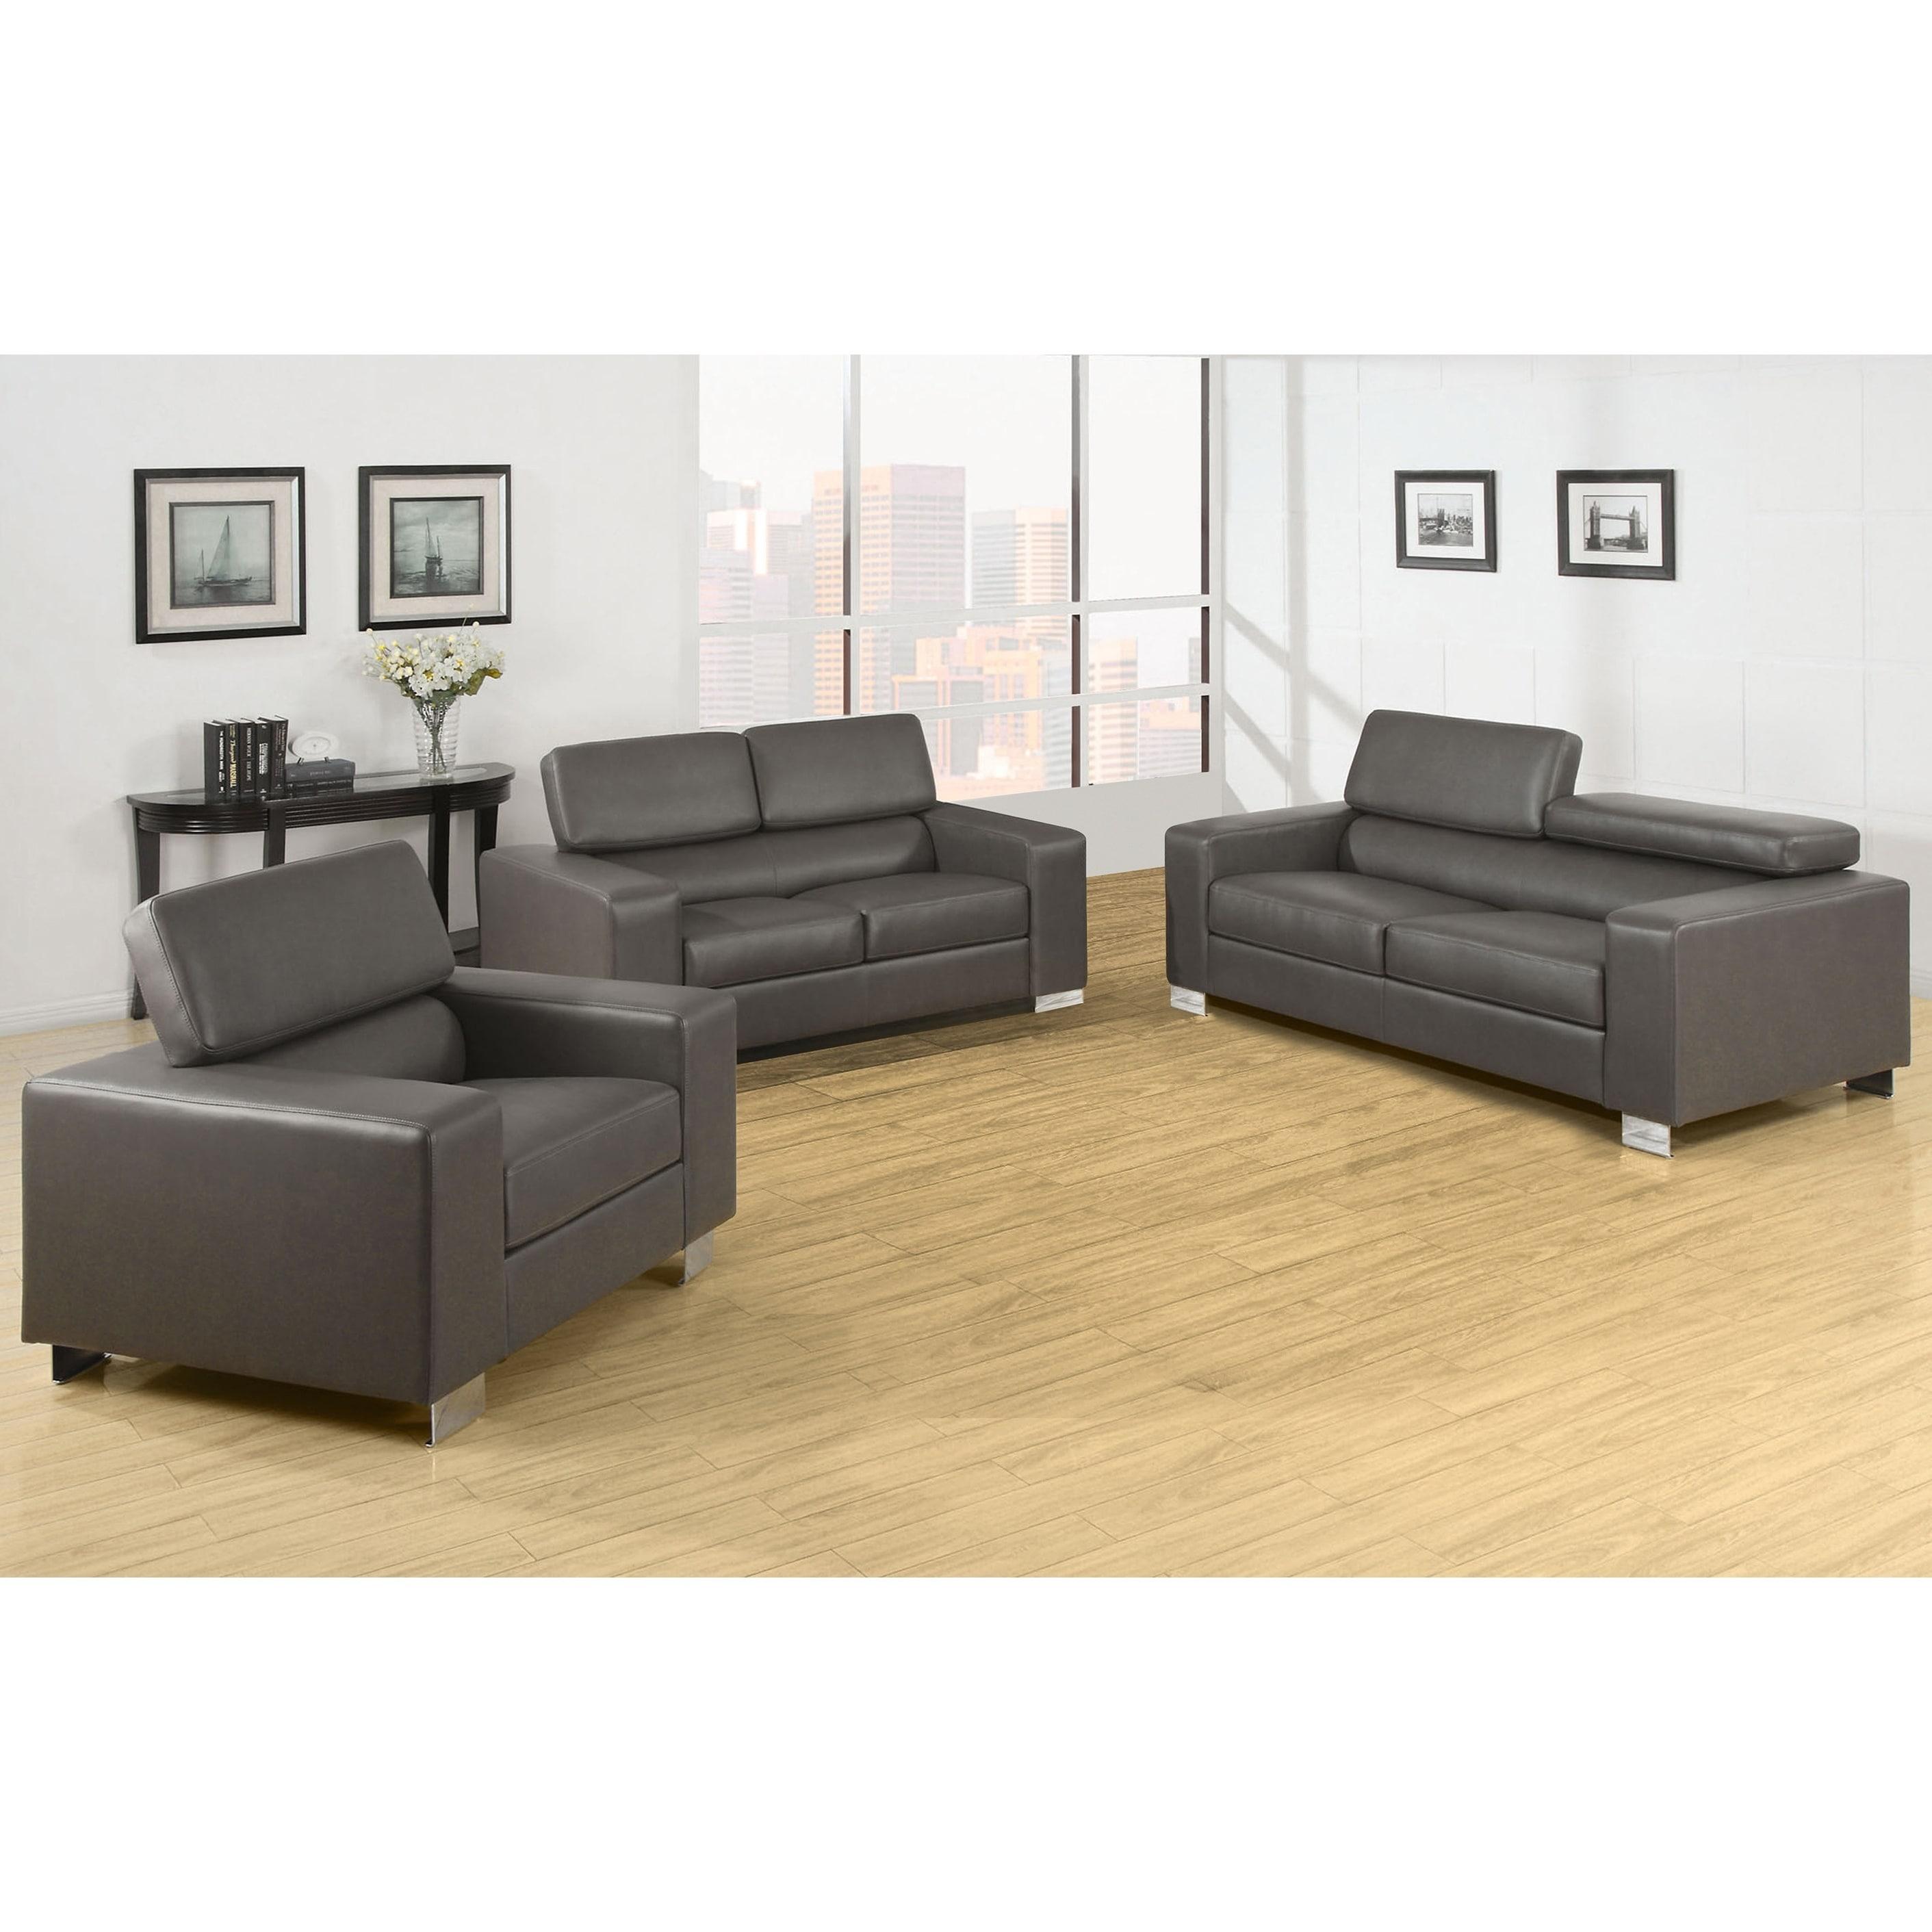 Furniture Of America Fash Contemporary Grey 3 Piece Sofa Set